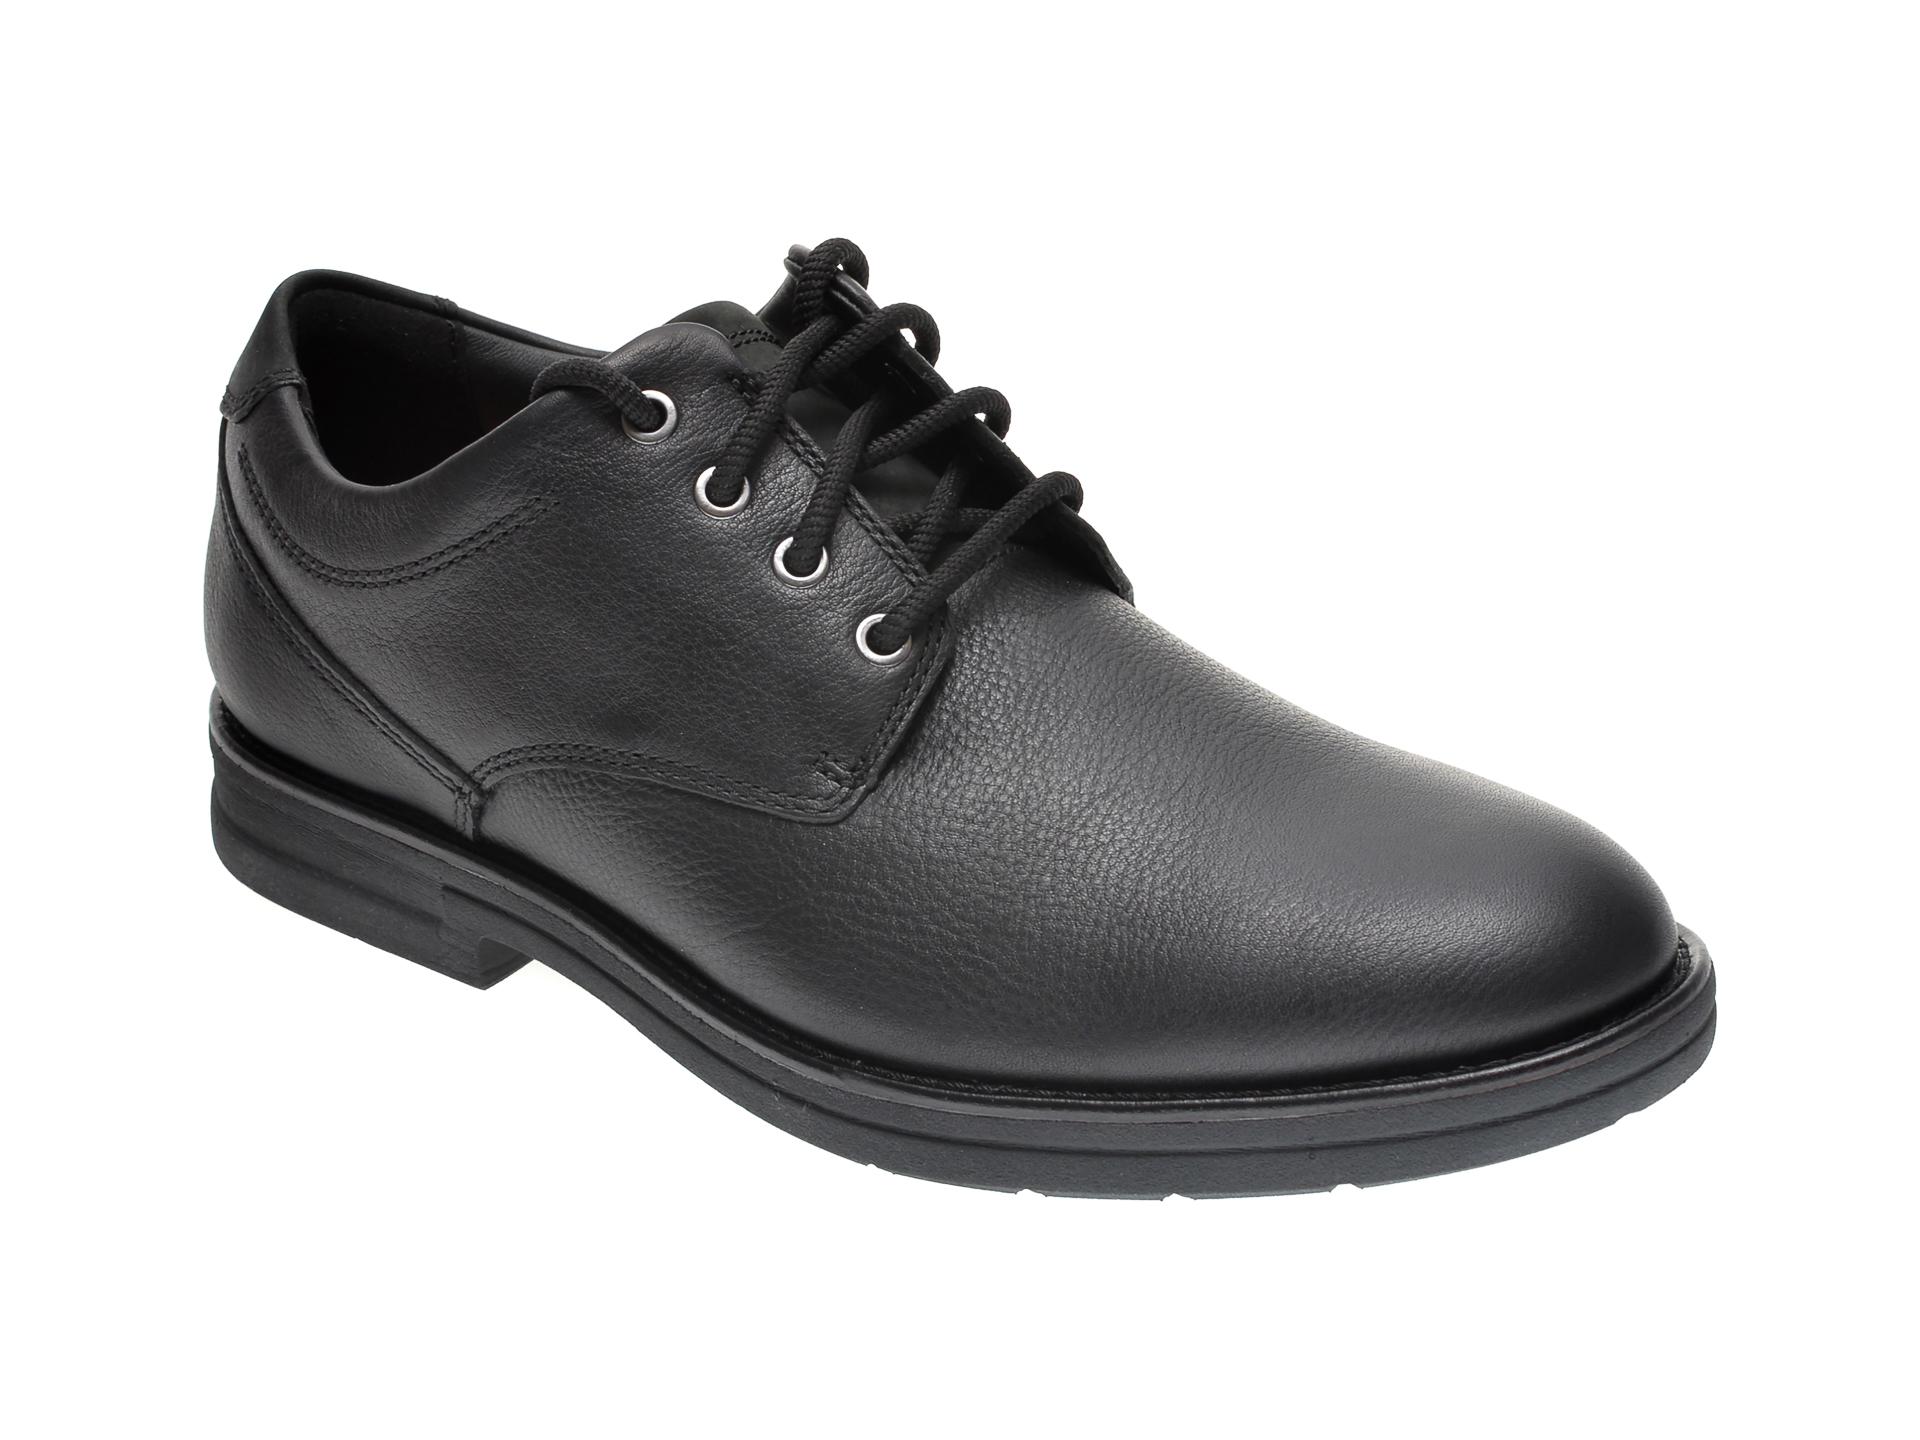 Pantofi CLARKS negri, BANNING PLAIN, din piele naturala imagine